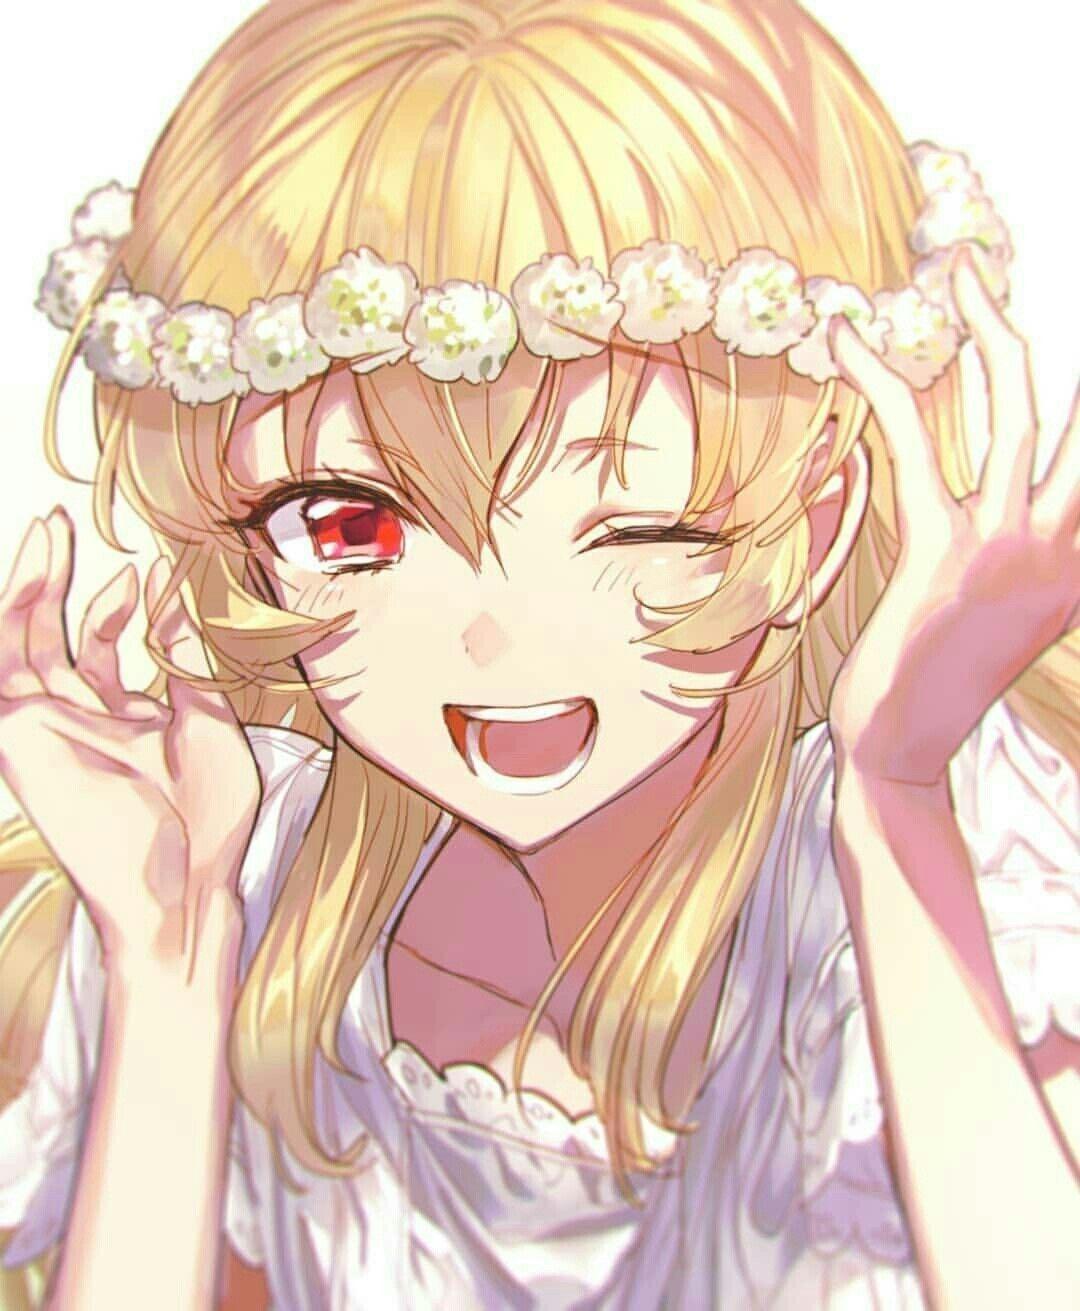 anime art bishoujo - beautiful